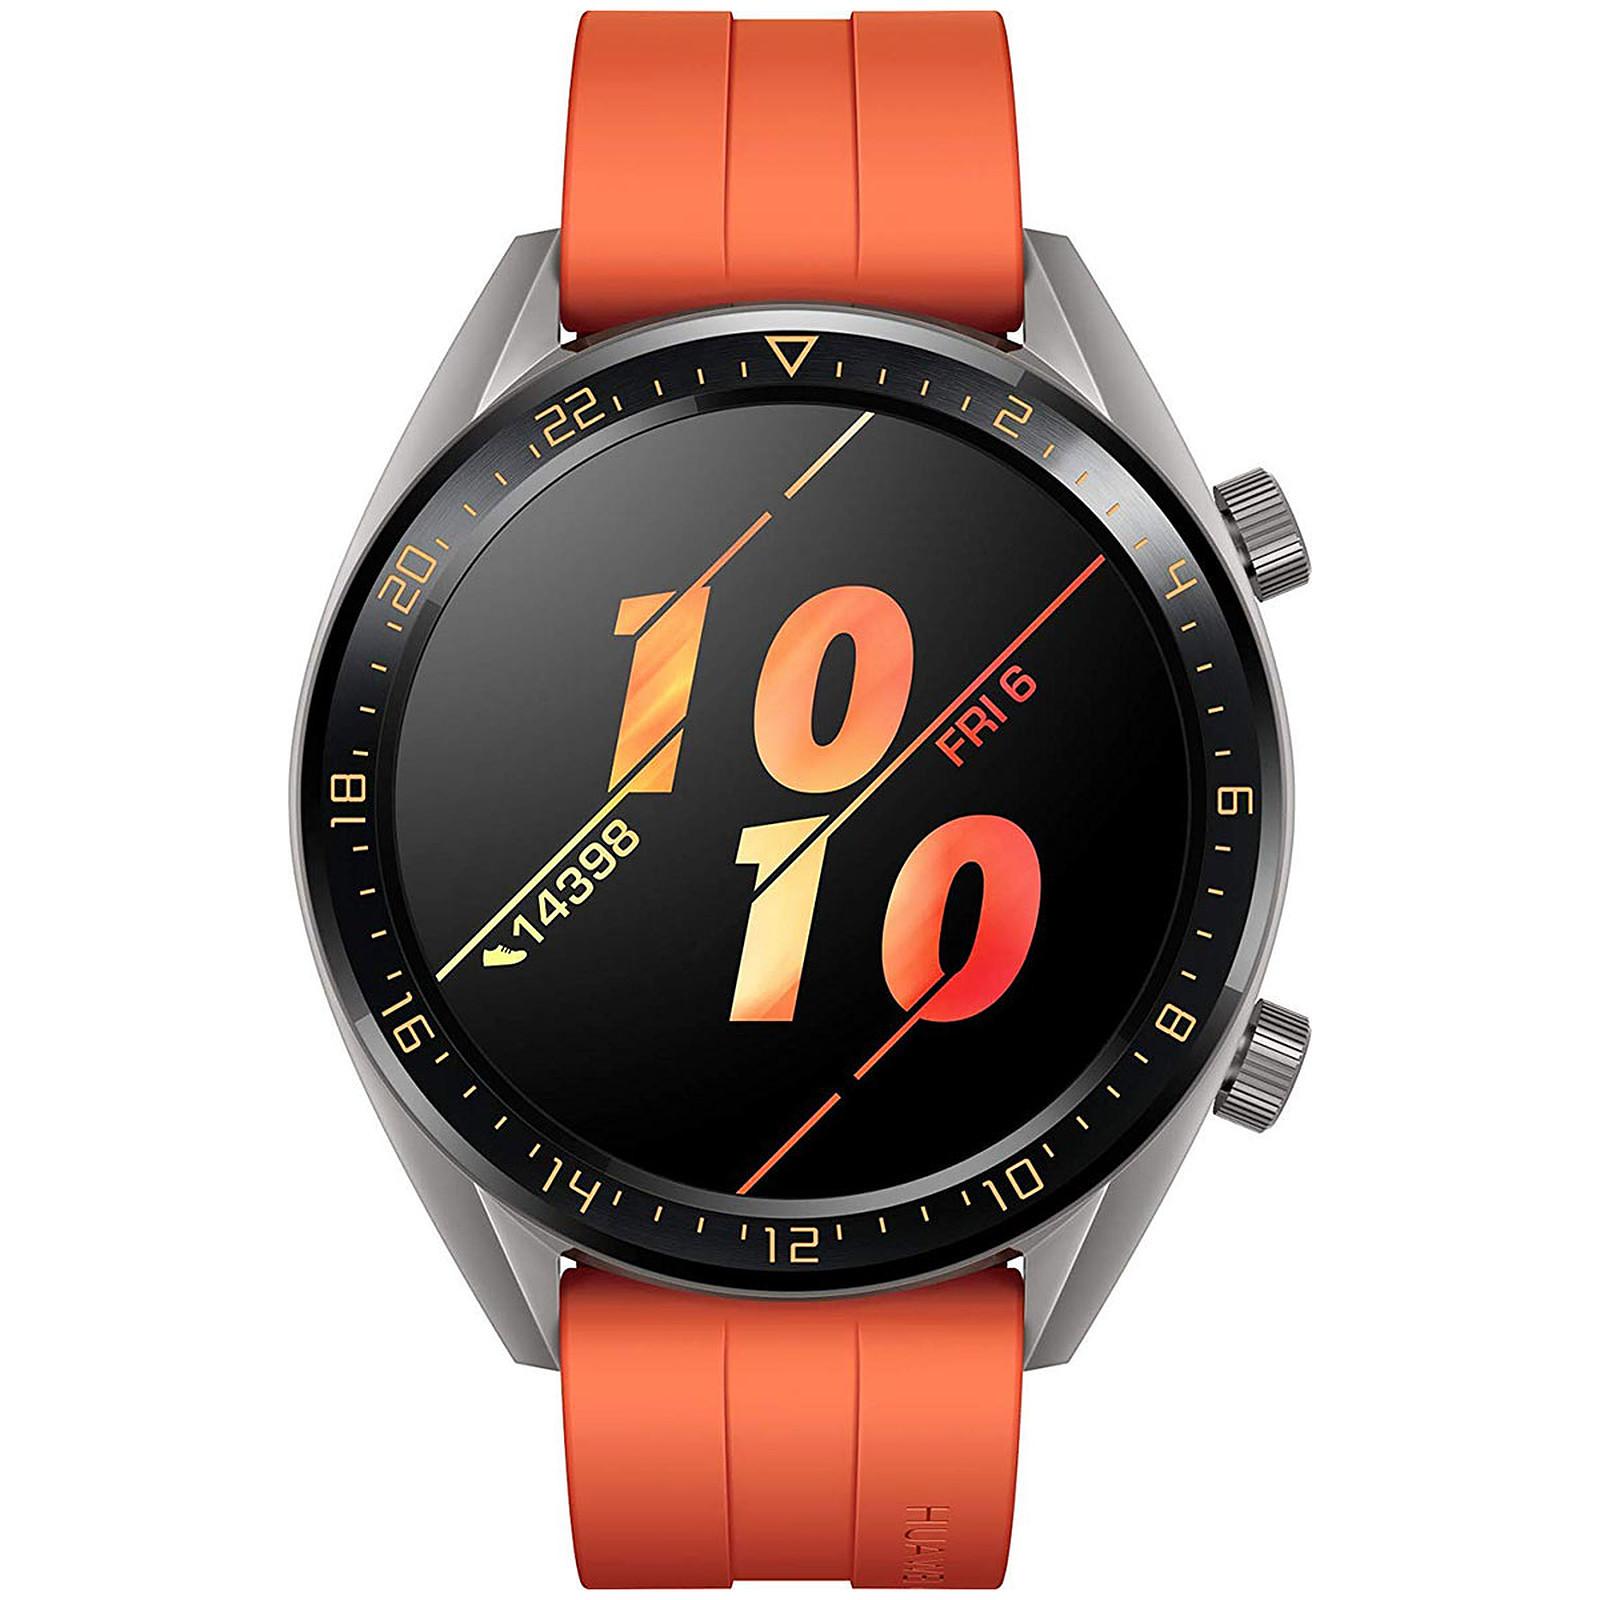 Huawei Watch GT Orange